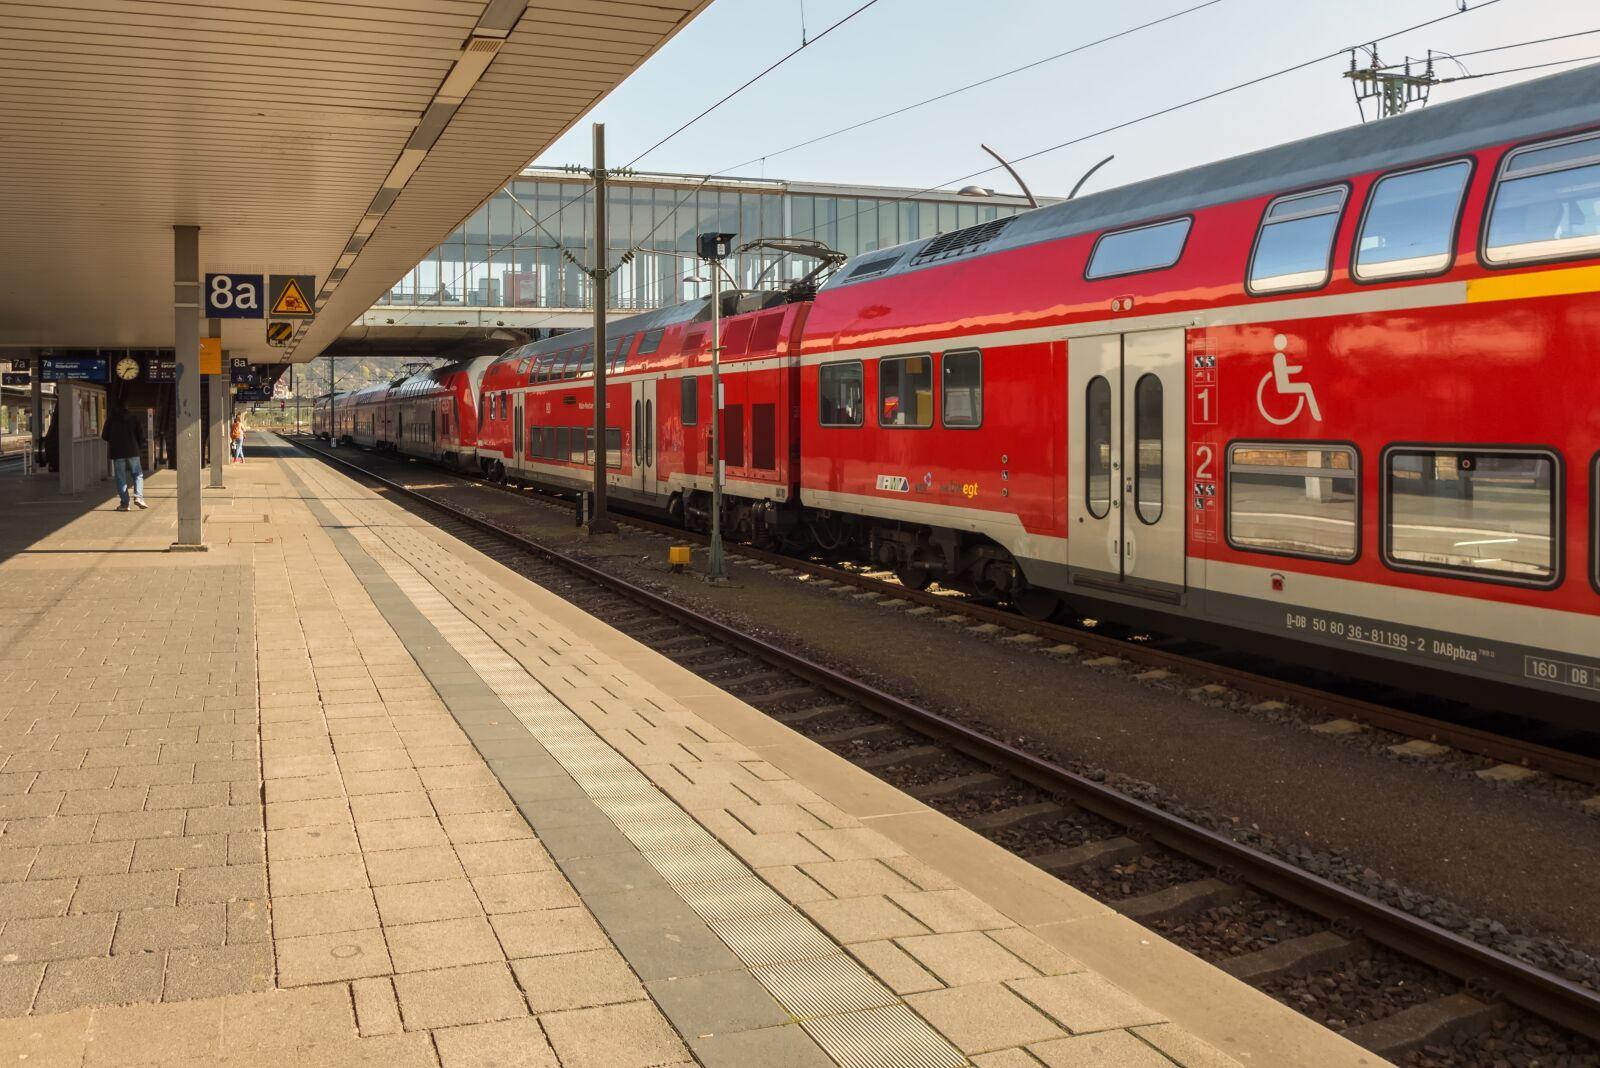 train, railway station, platform